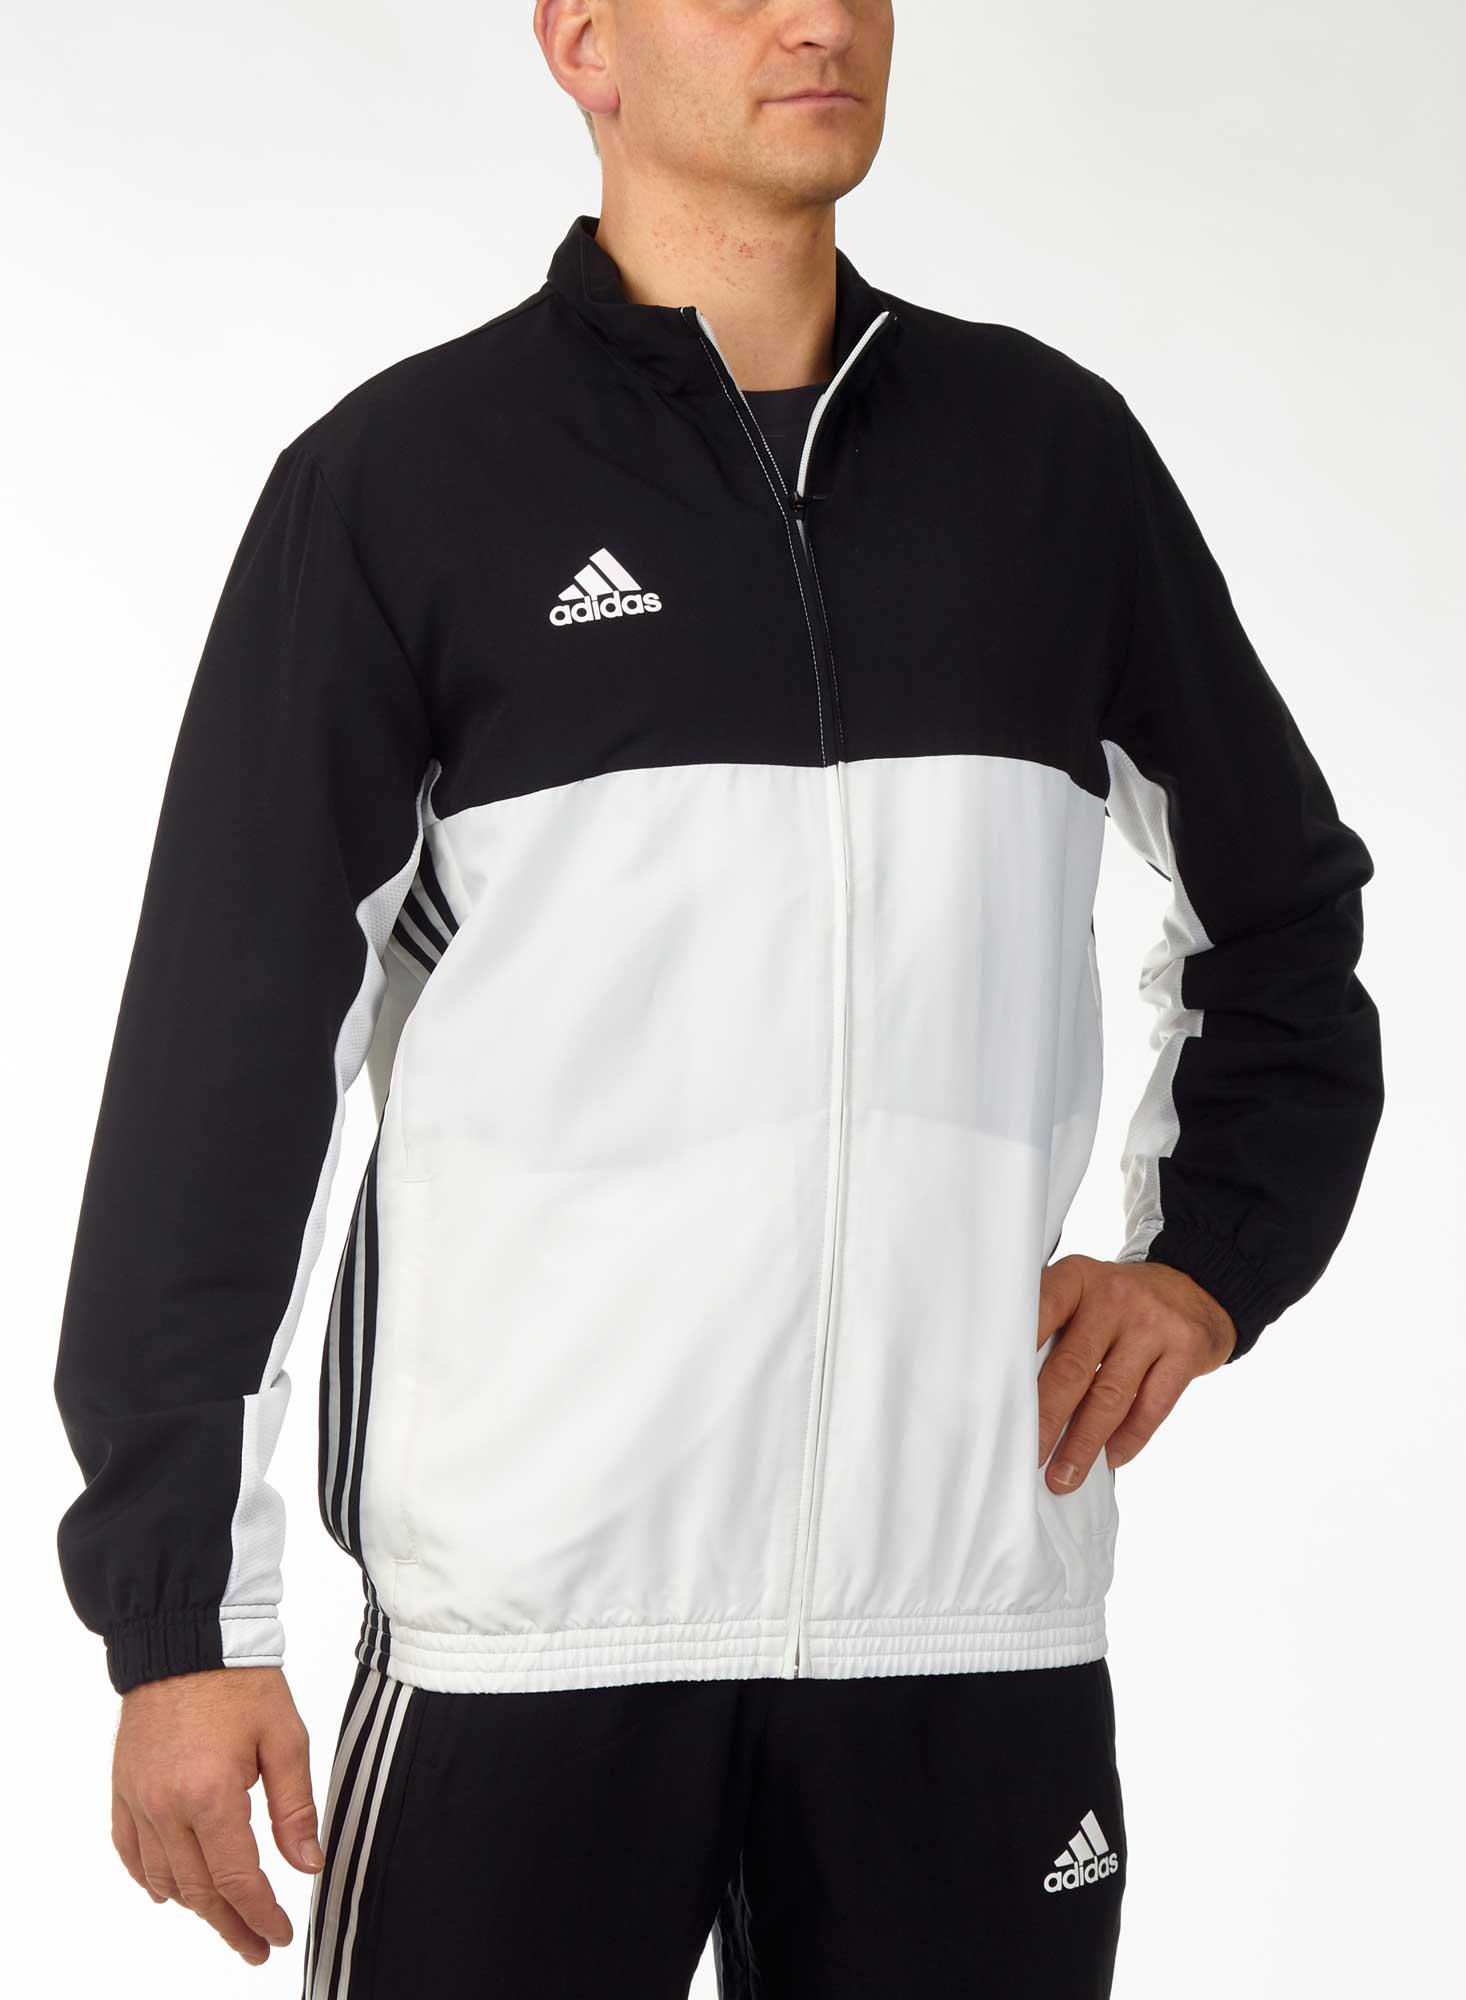 adidas T16 Team Jacket Männer schwarzweiß, AJ5382